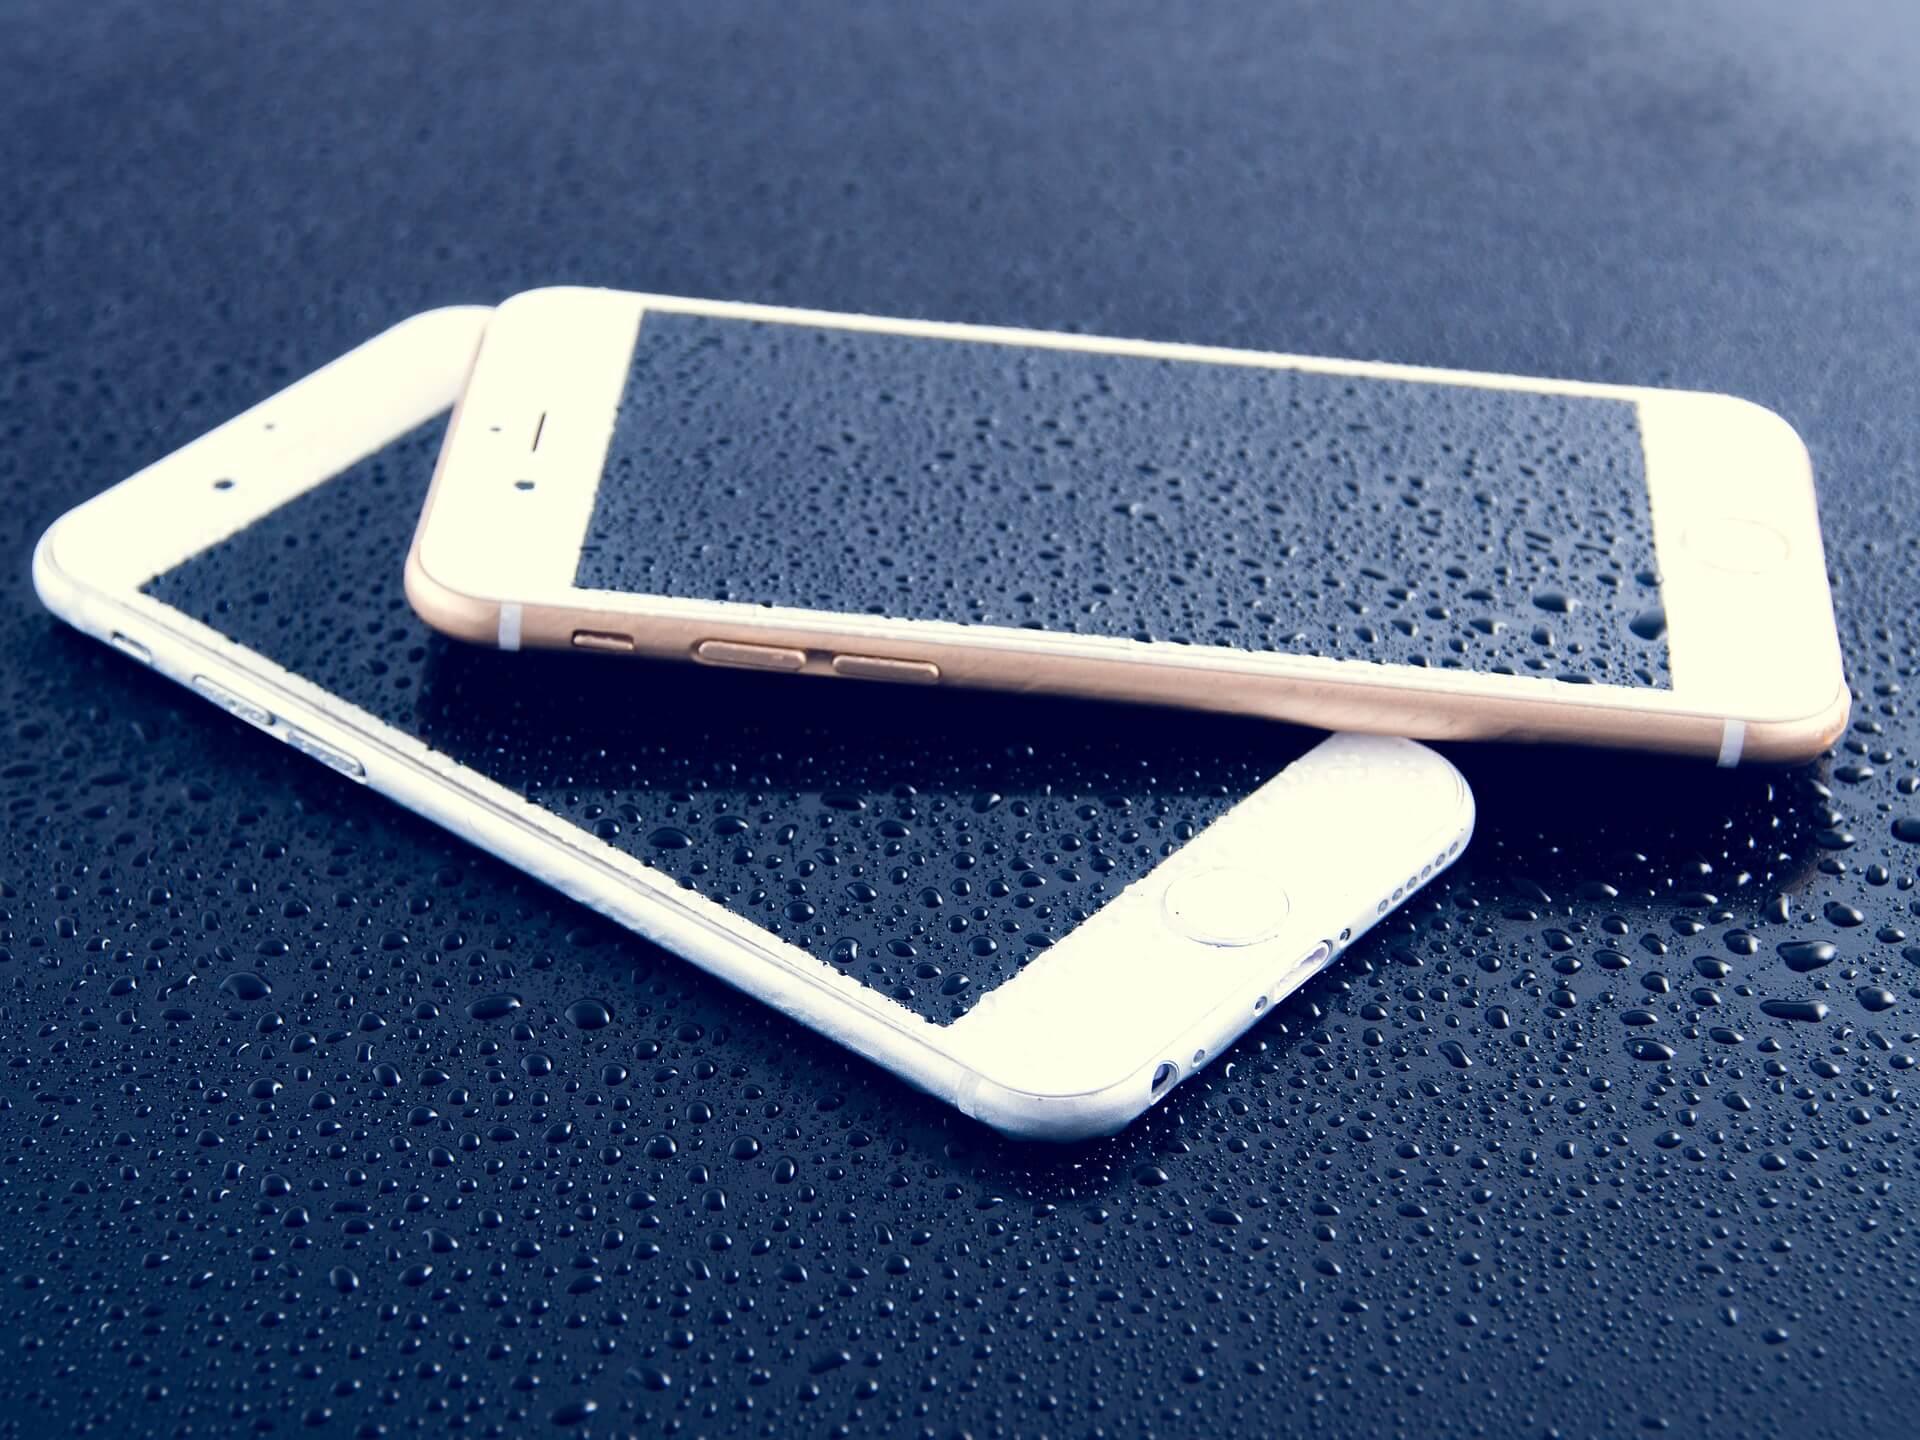 iphone.2